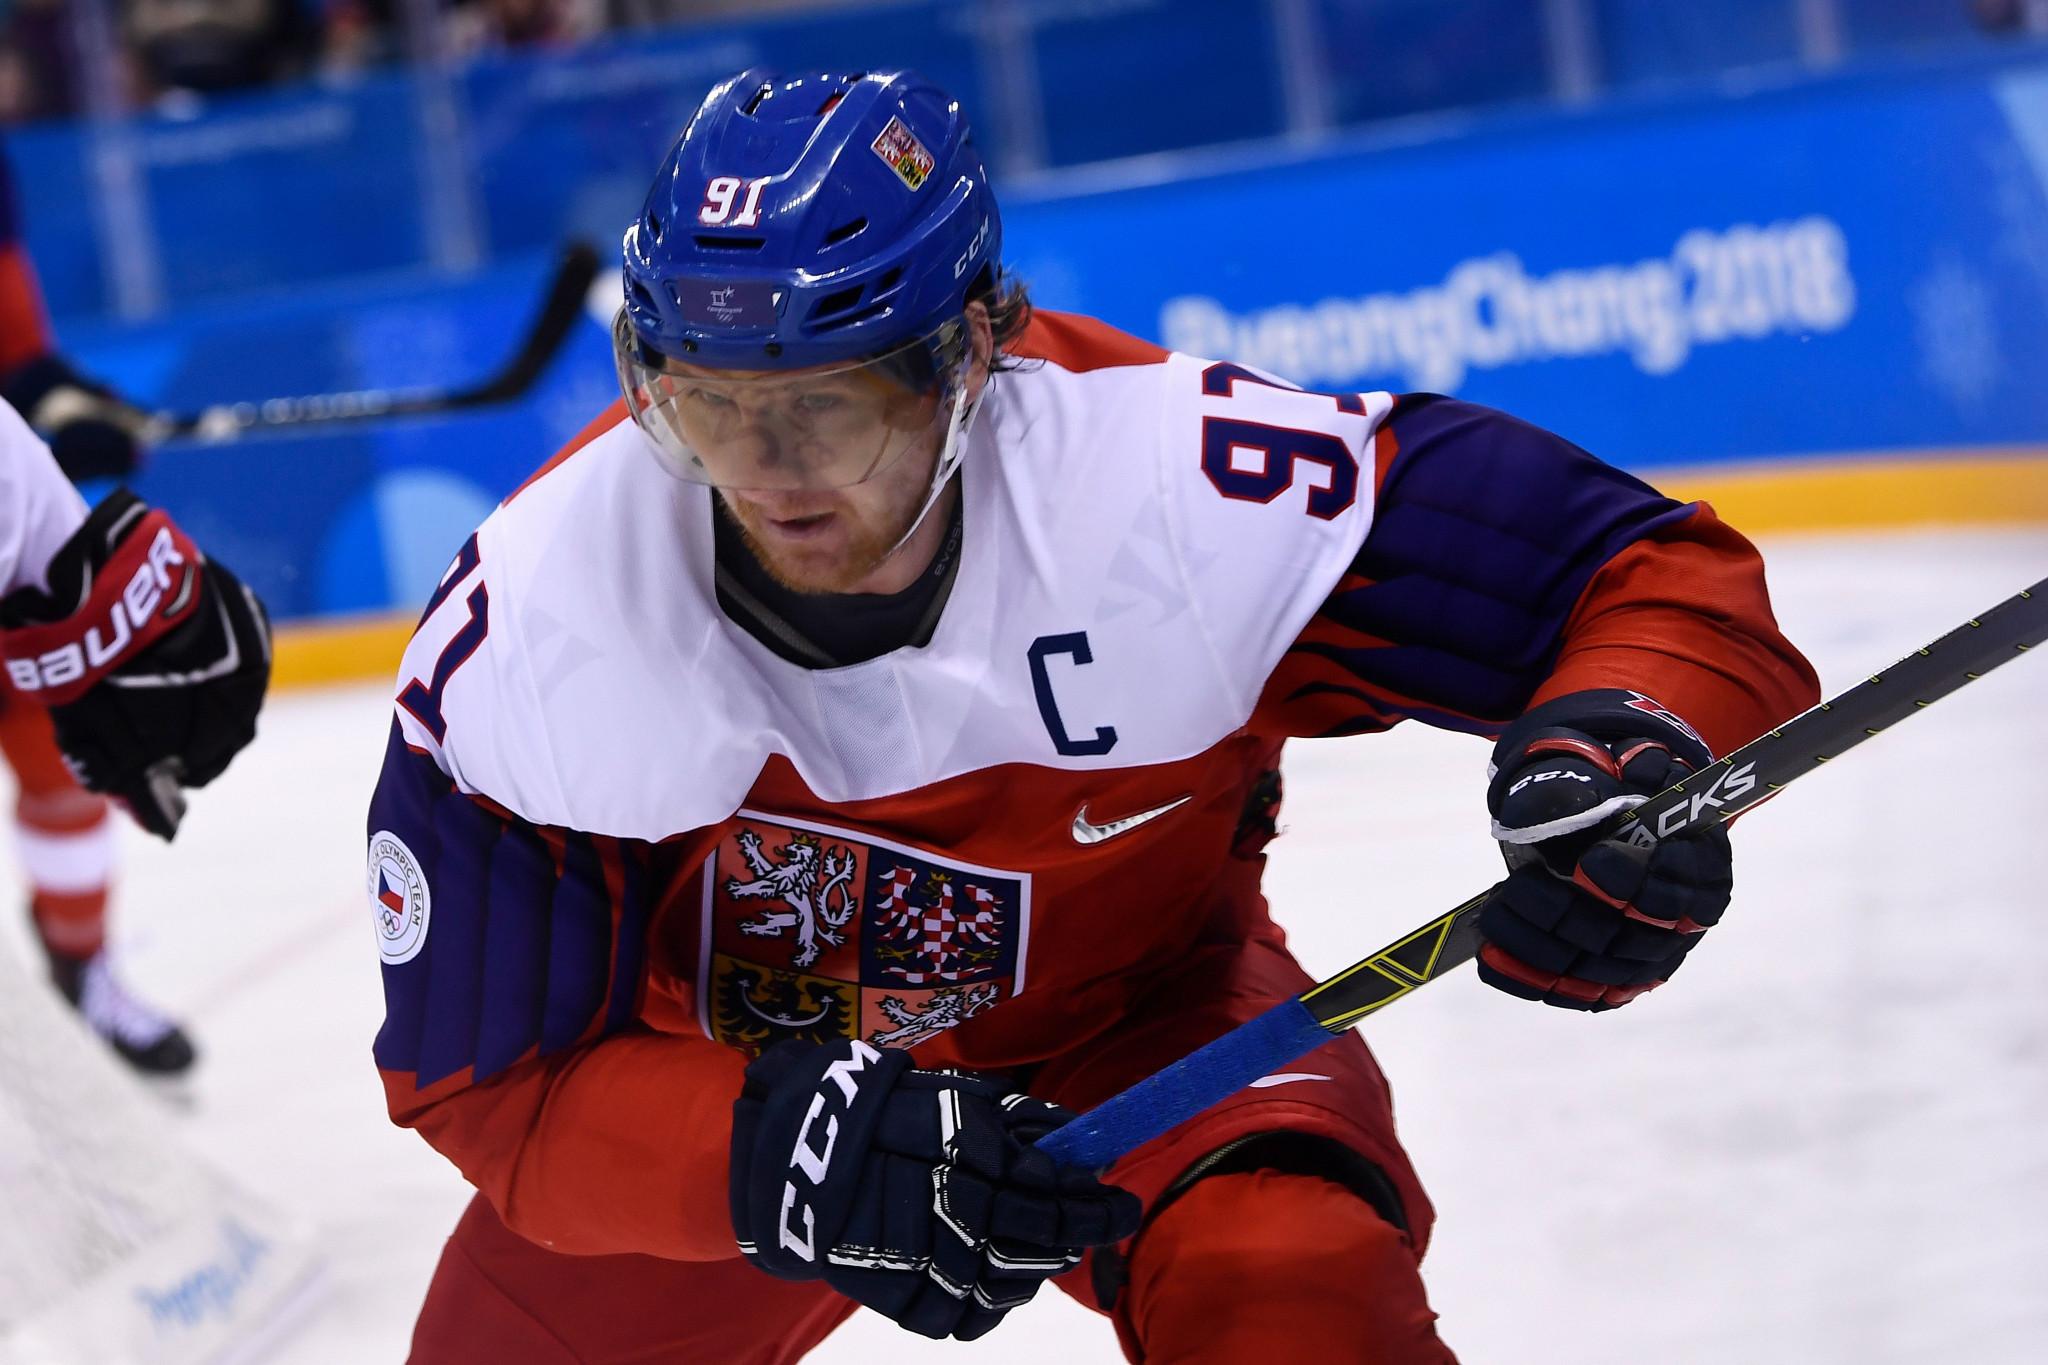 Czech ice hockey player Erat announces retirement